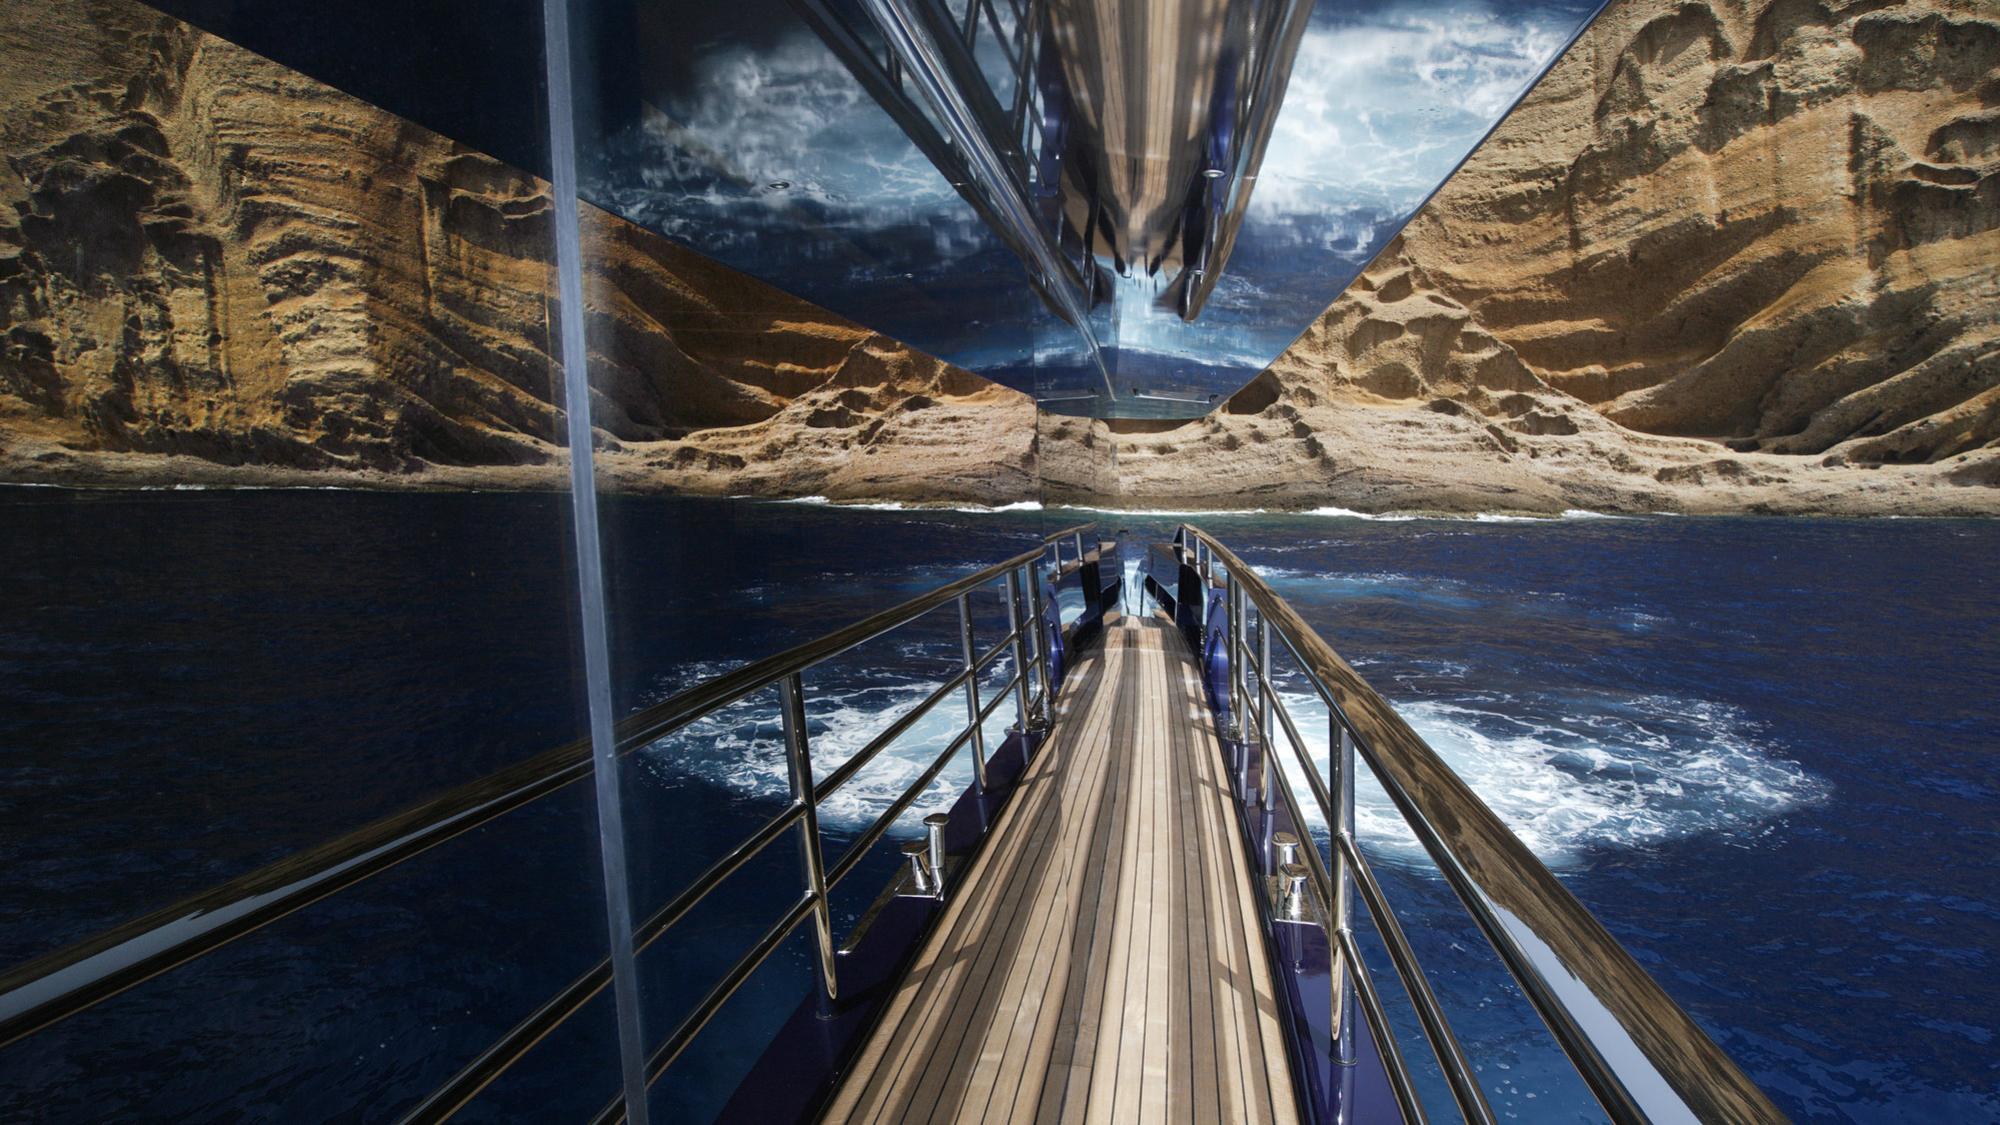 blade-motor-yacht-mmgi-2010-44m-side-detail